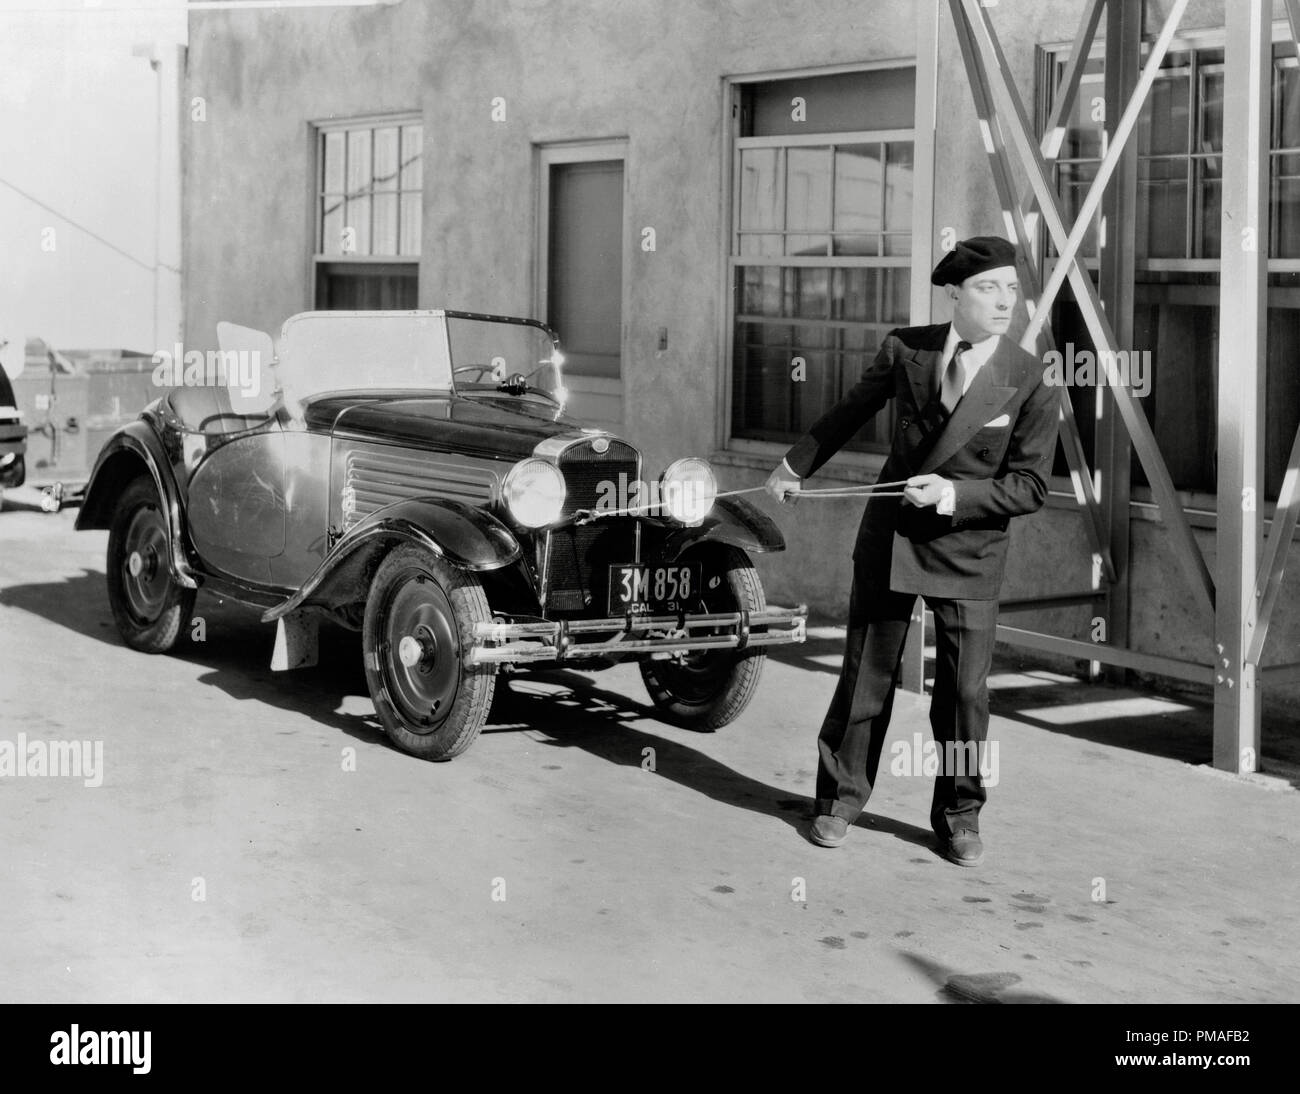 silent-film-comedian-buster-keaton-circa-1920-file-reference-32633-438tha-PMAFB2.jpg